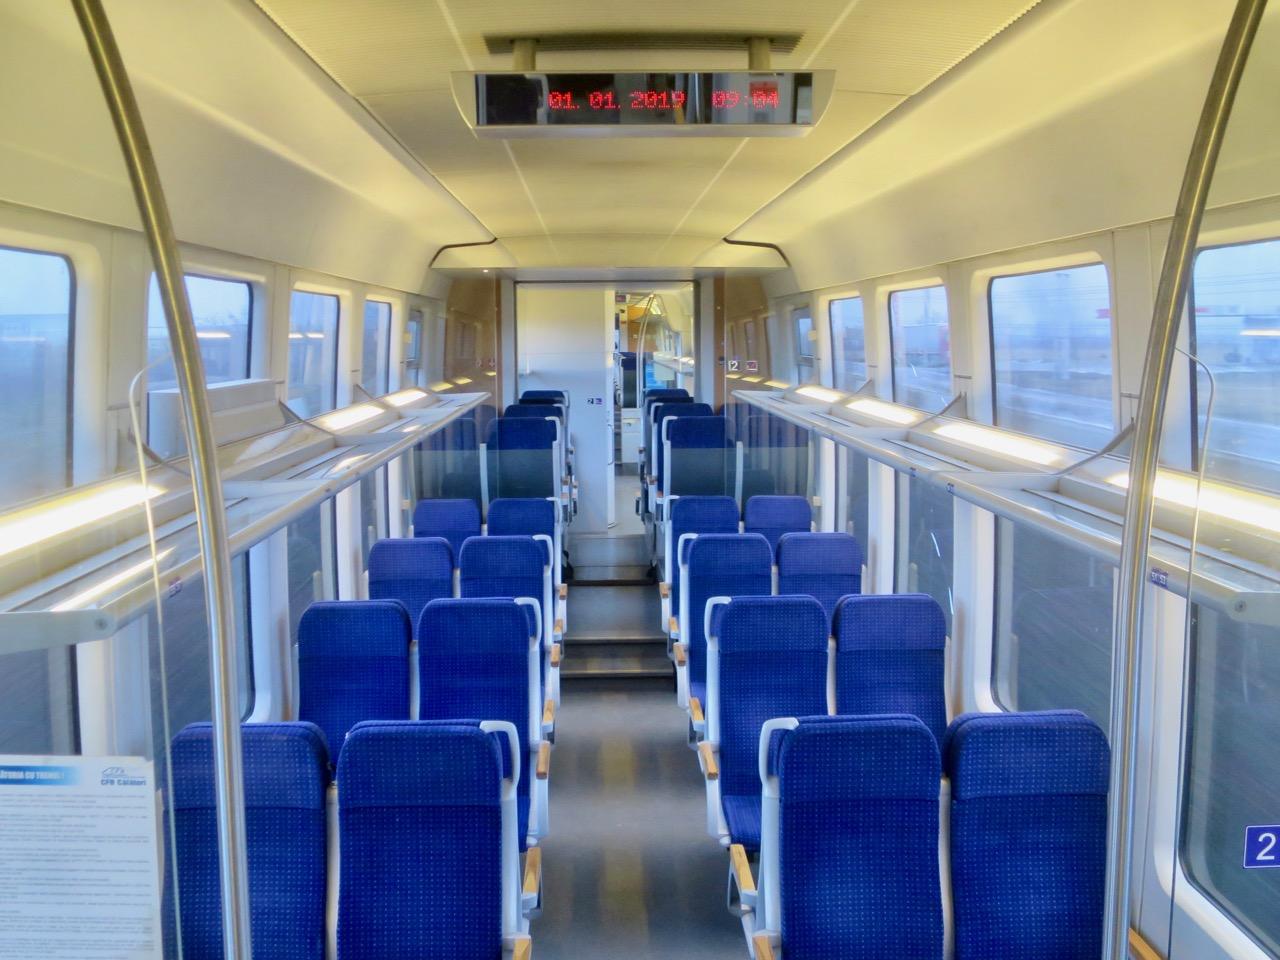 Trens na Romenia 1 03